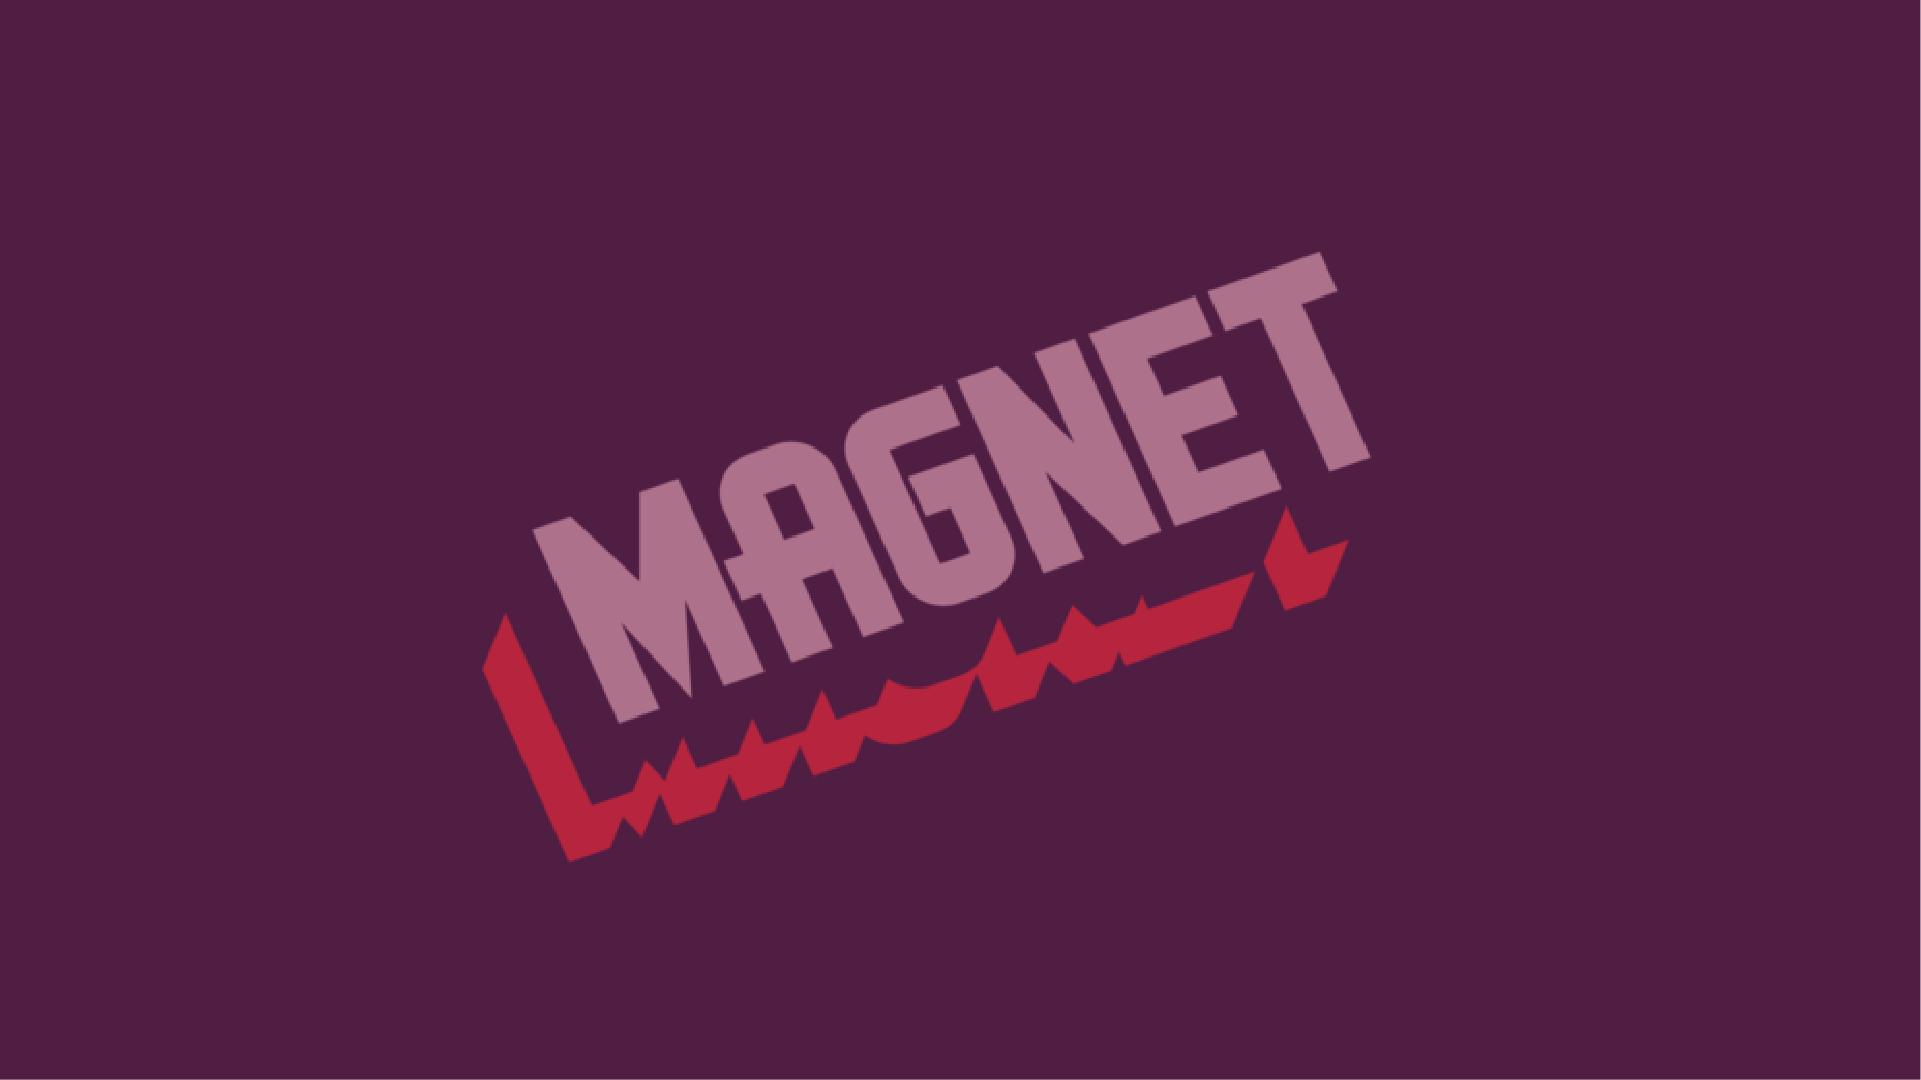 Magnet  Brand Identity, Typography, Website  In-Progress